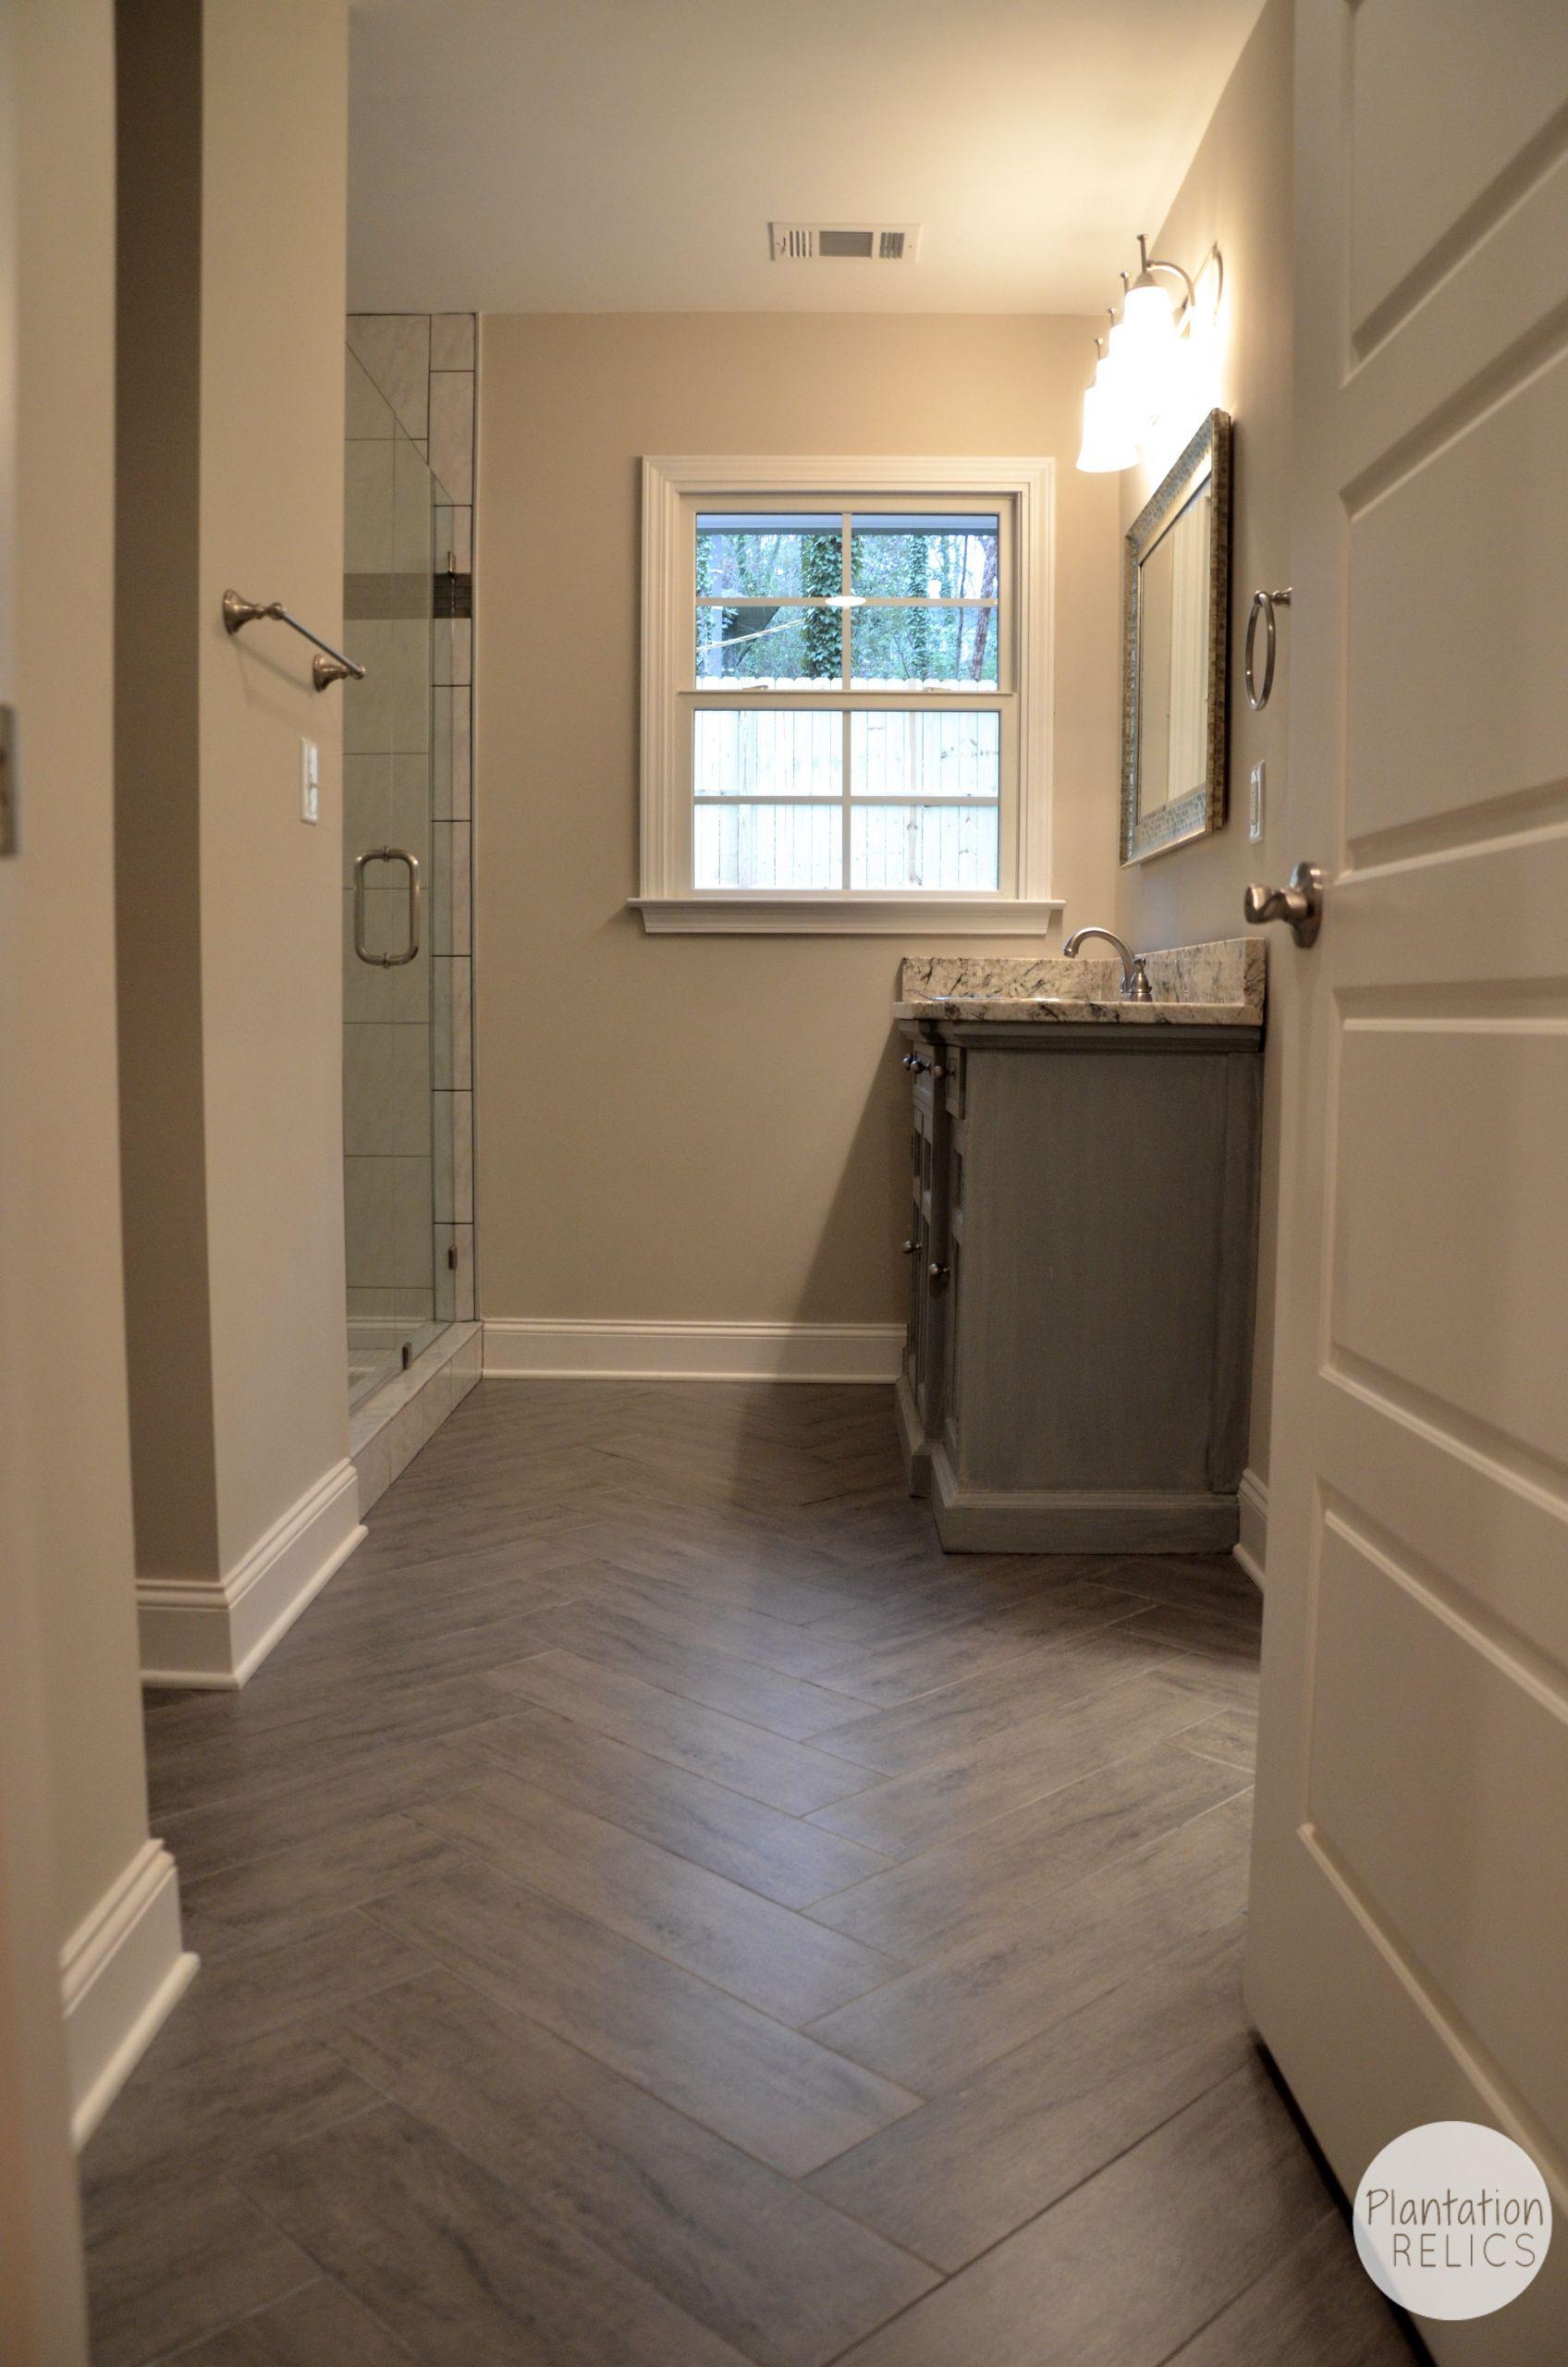 Bathroom Tile Floors  Hall Bathroom AFTER Renovation Flip House 1 Plantation